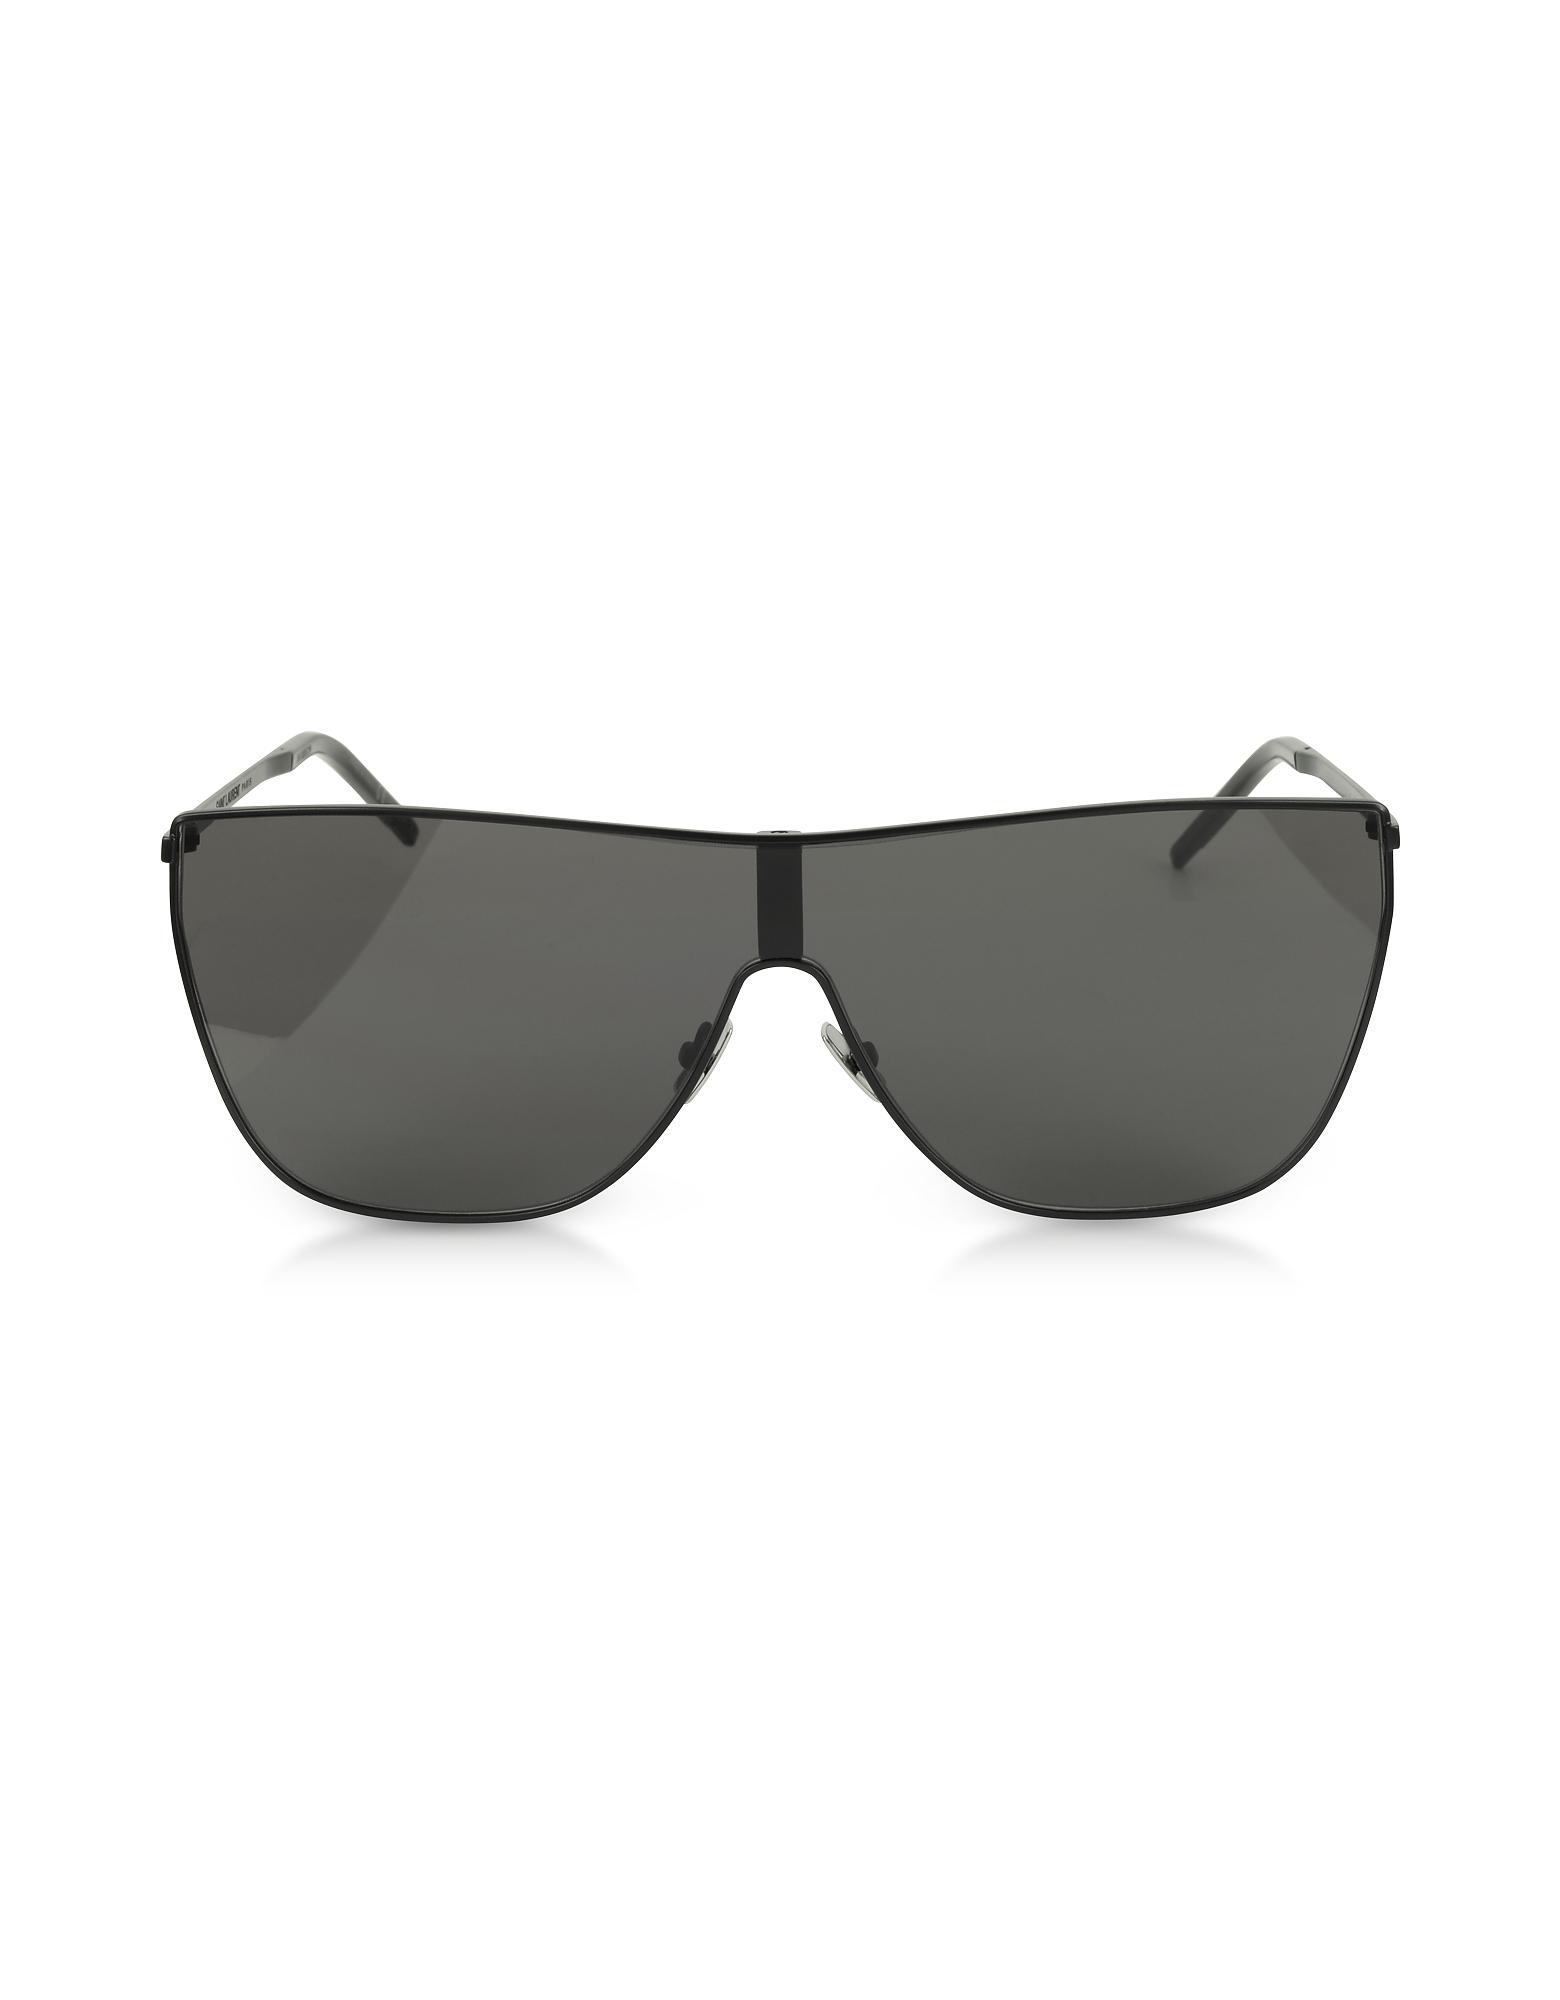 SL1 MASK Metal Frame Men's Sunglasses